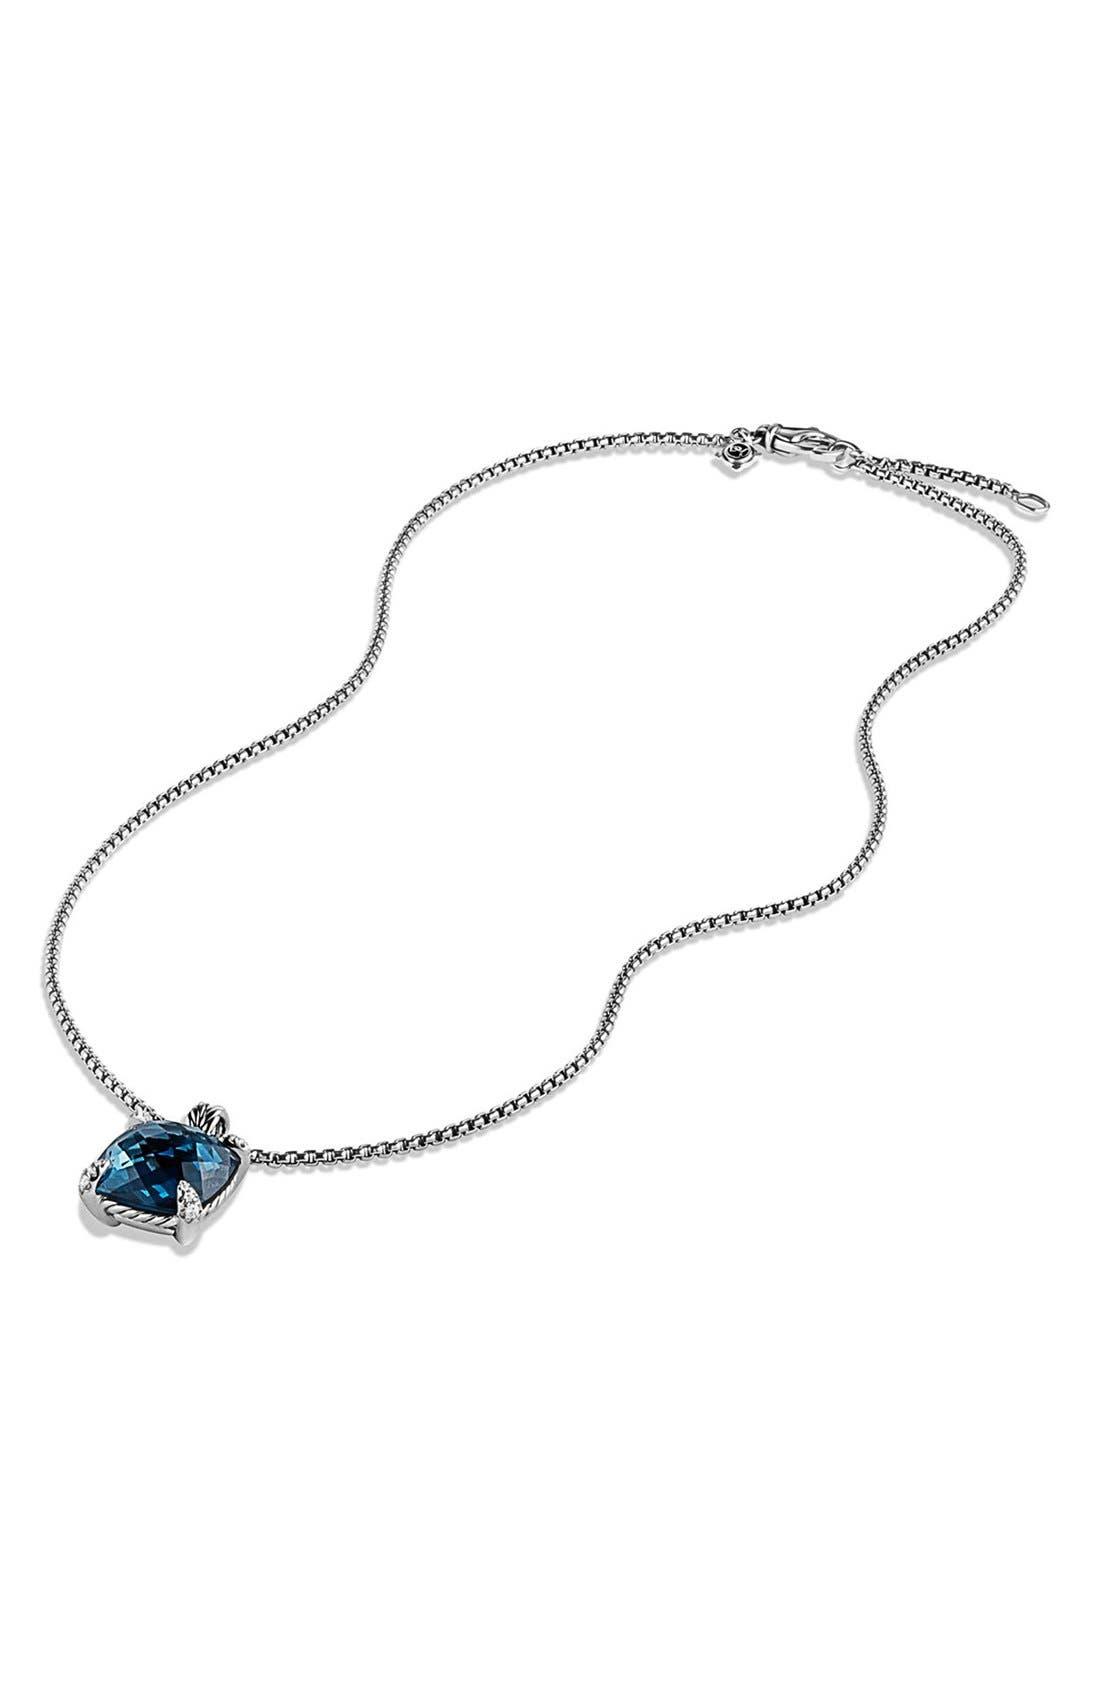 'Châtelaine' Pendant Necklace with Semiprecious Stone and Diamonds,                             Alternate thumbnail 2, color,                             Silver/ Hampton Blue Topaz